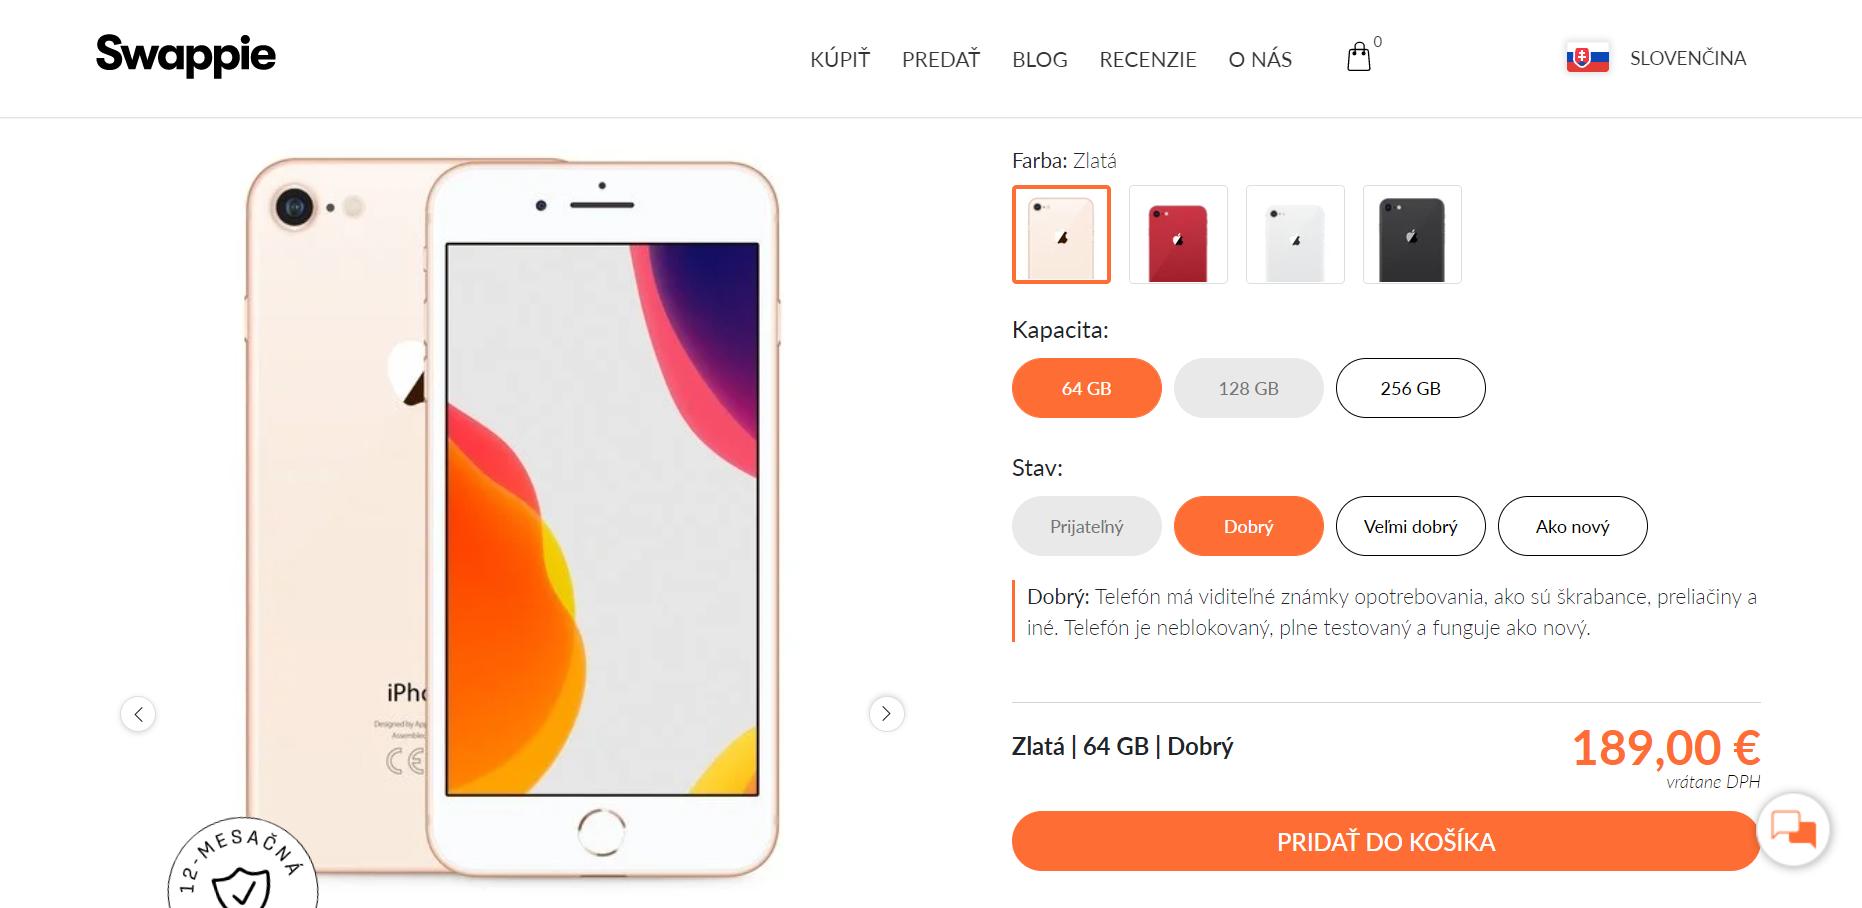 Kúp si iPhone o stovky eur lacnejšie